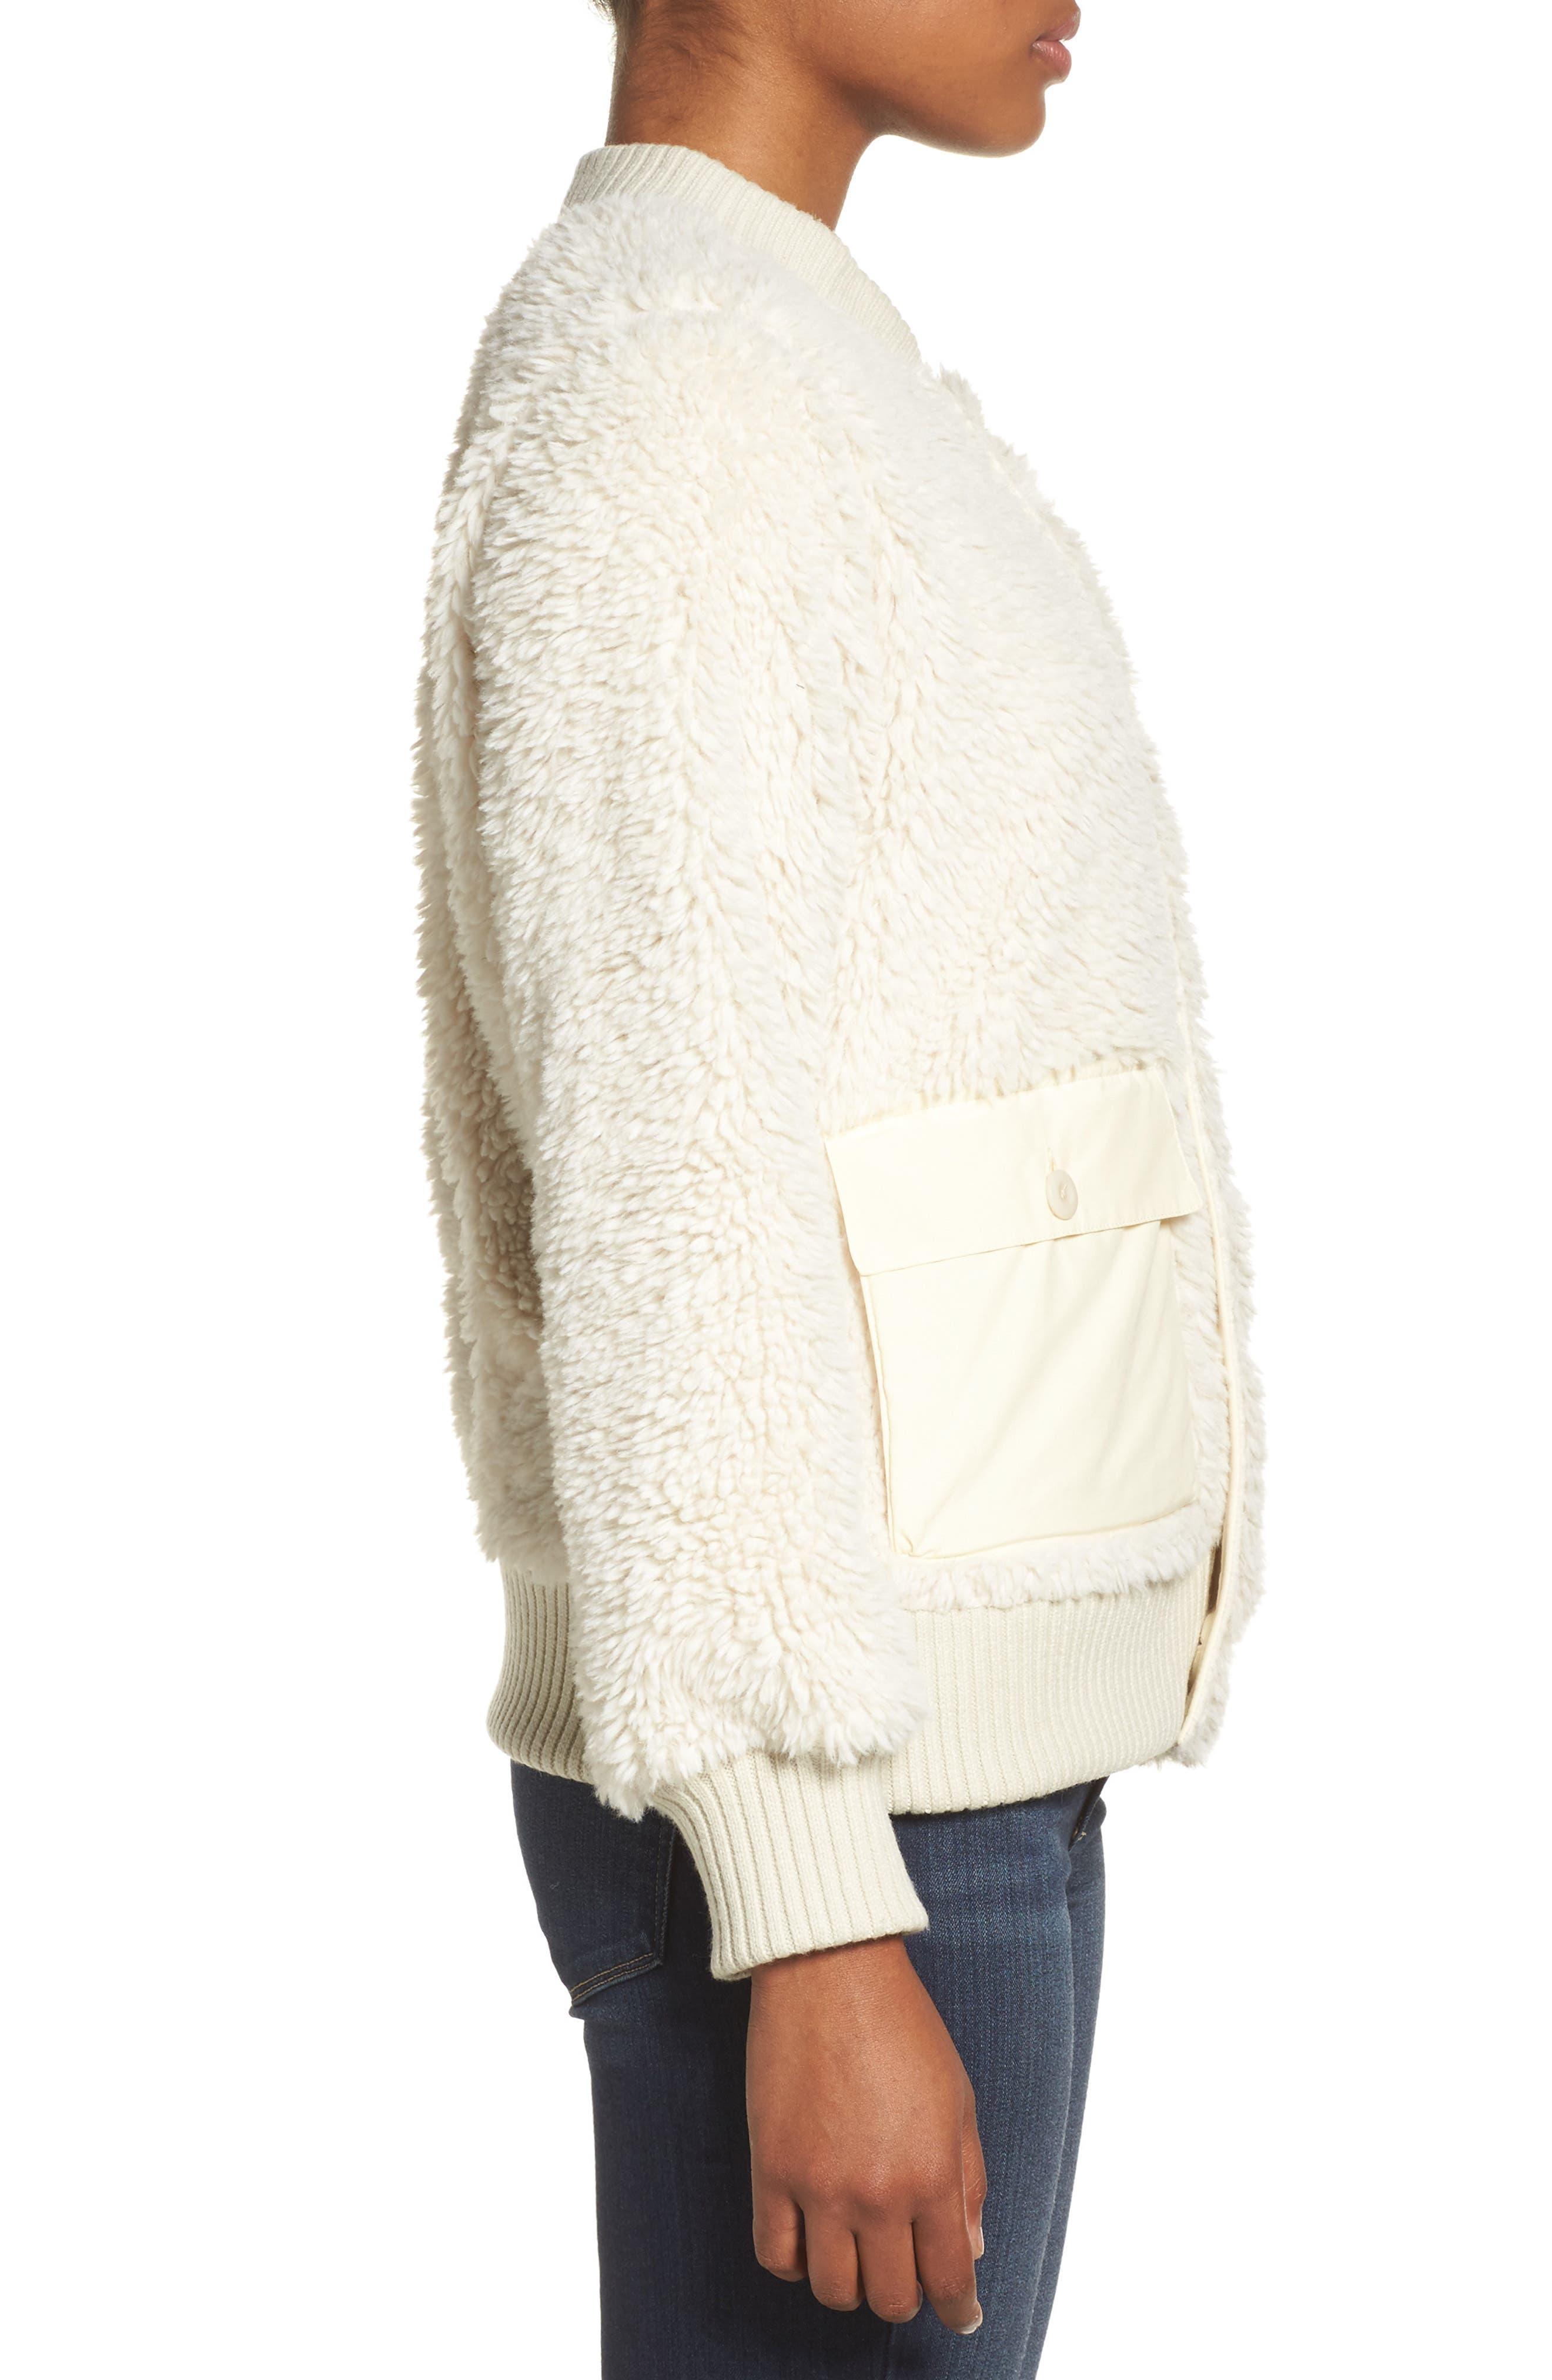 Shawmut High Pile DRYRIDE Thermex Fleece Jacket,                             Alternate thumbnail 3, color,                             Bone White